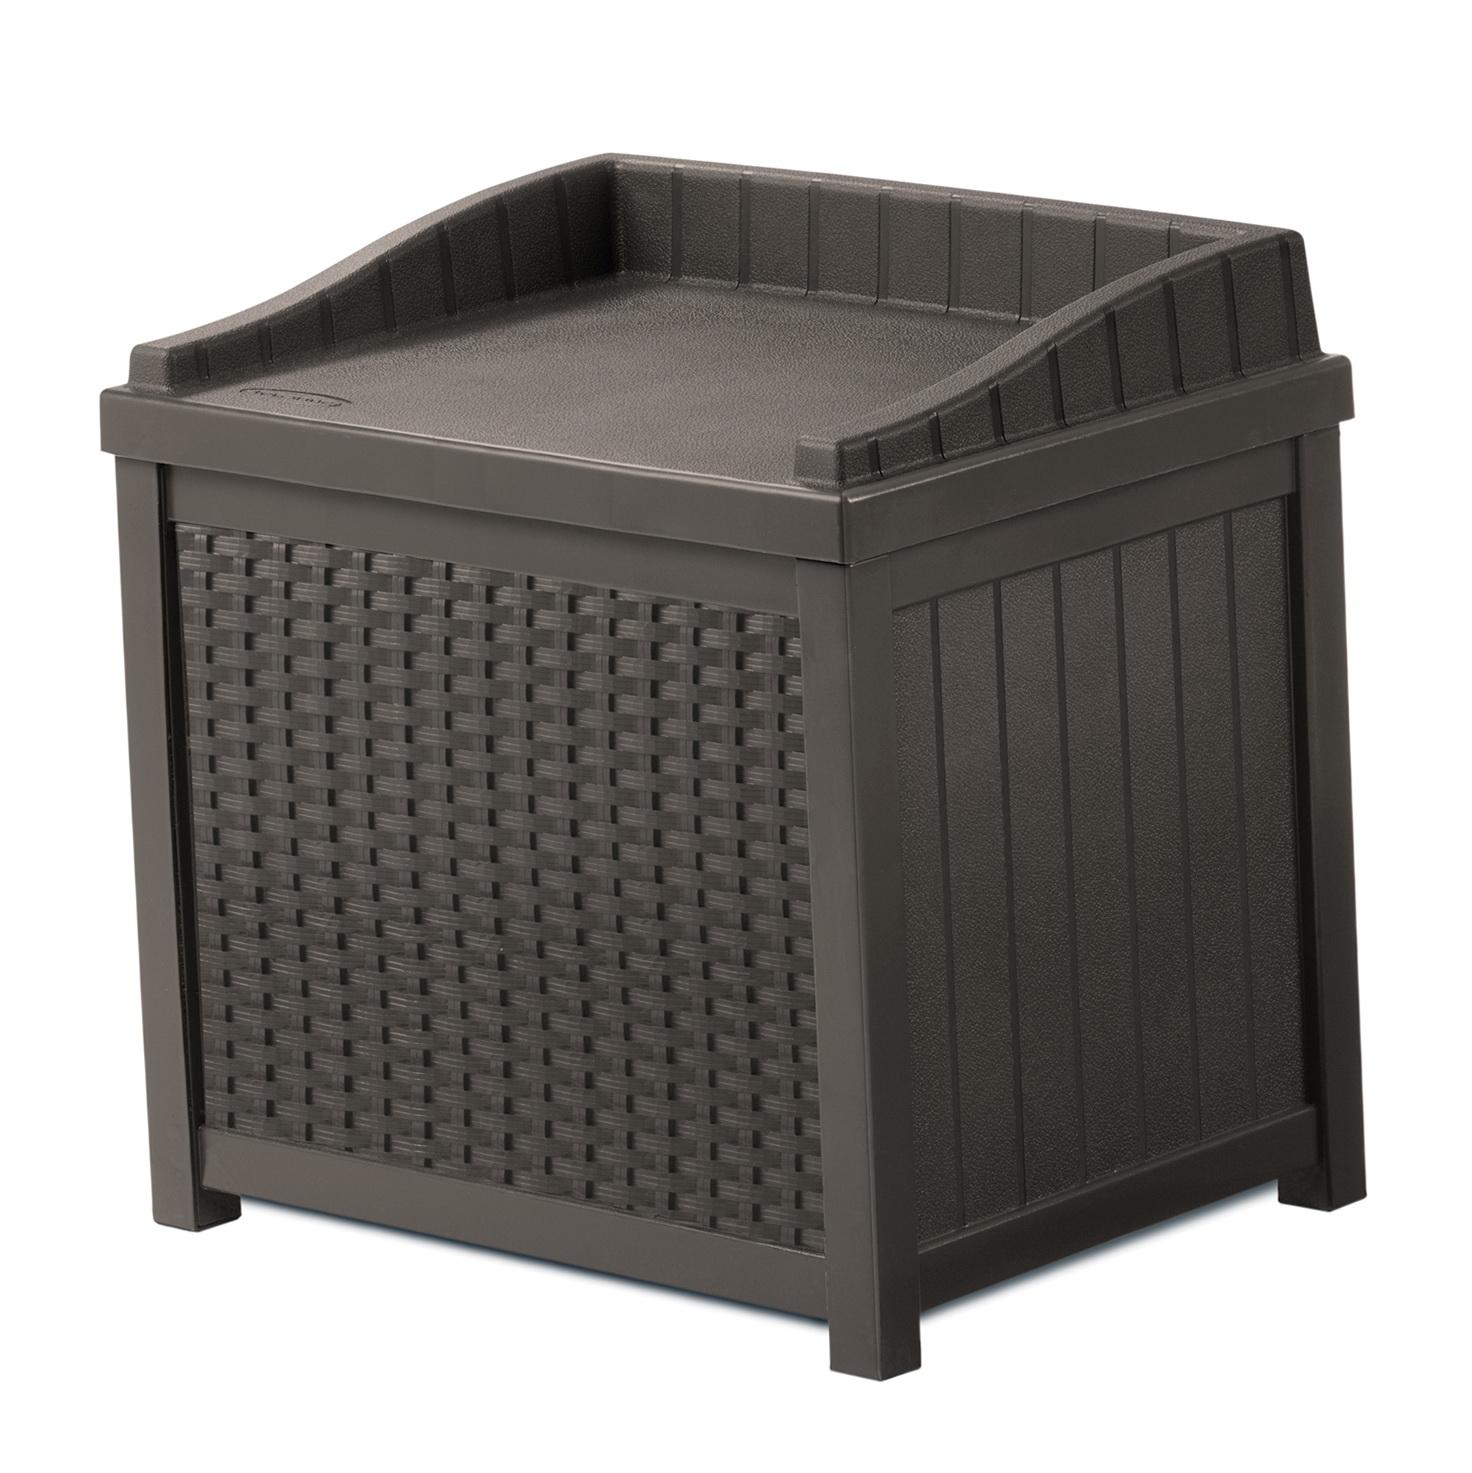 Suncast Resin Wicker Deck Box 22 Gallon